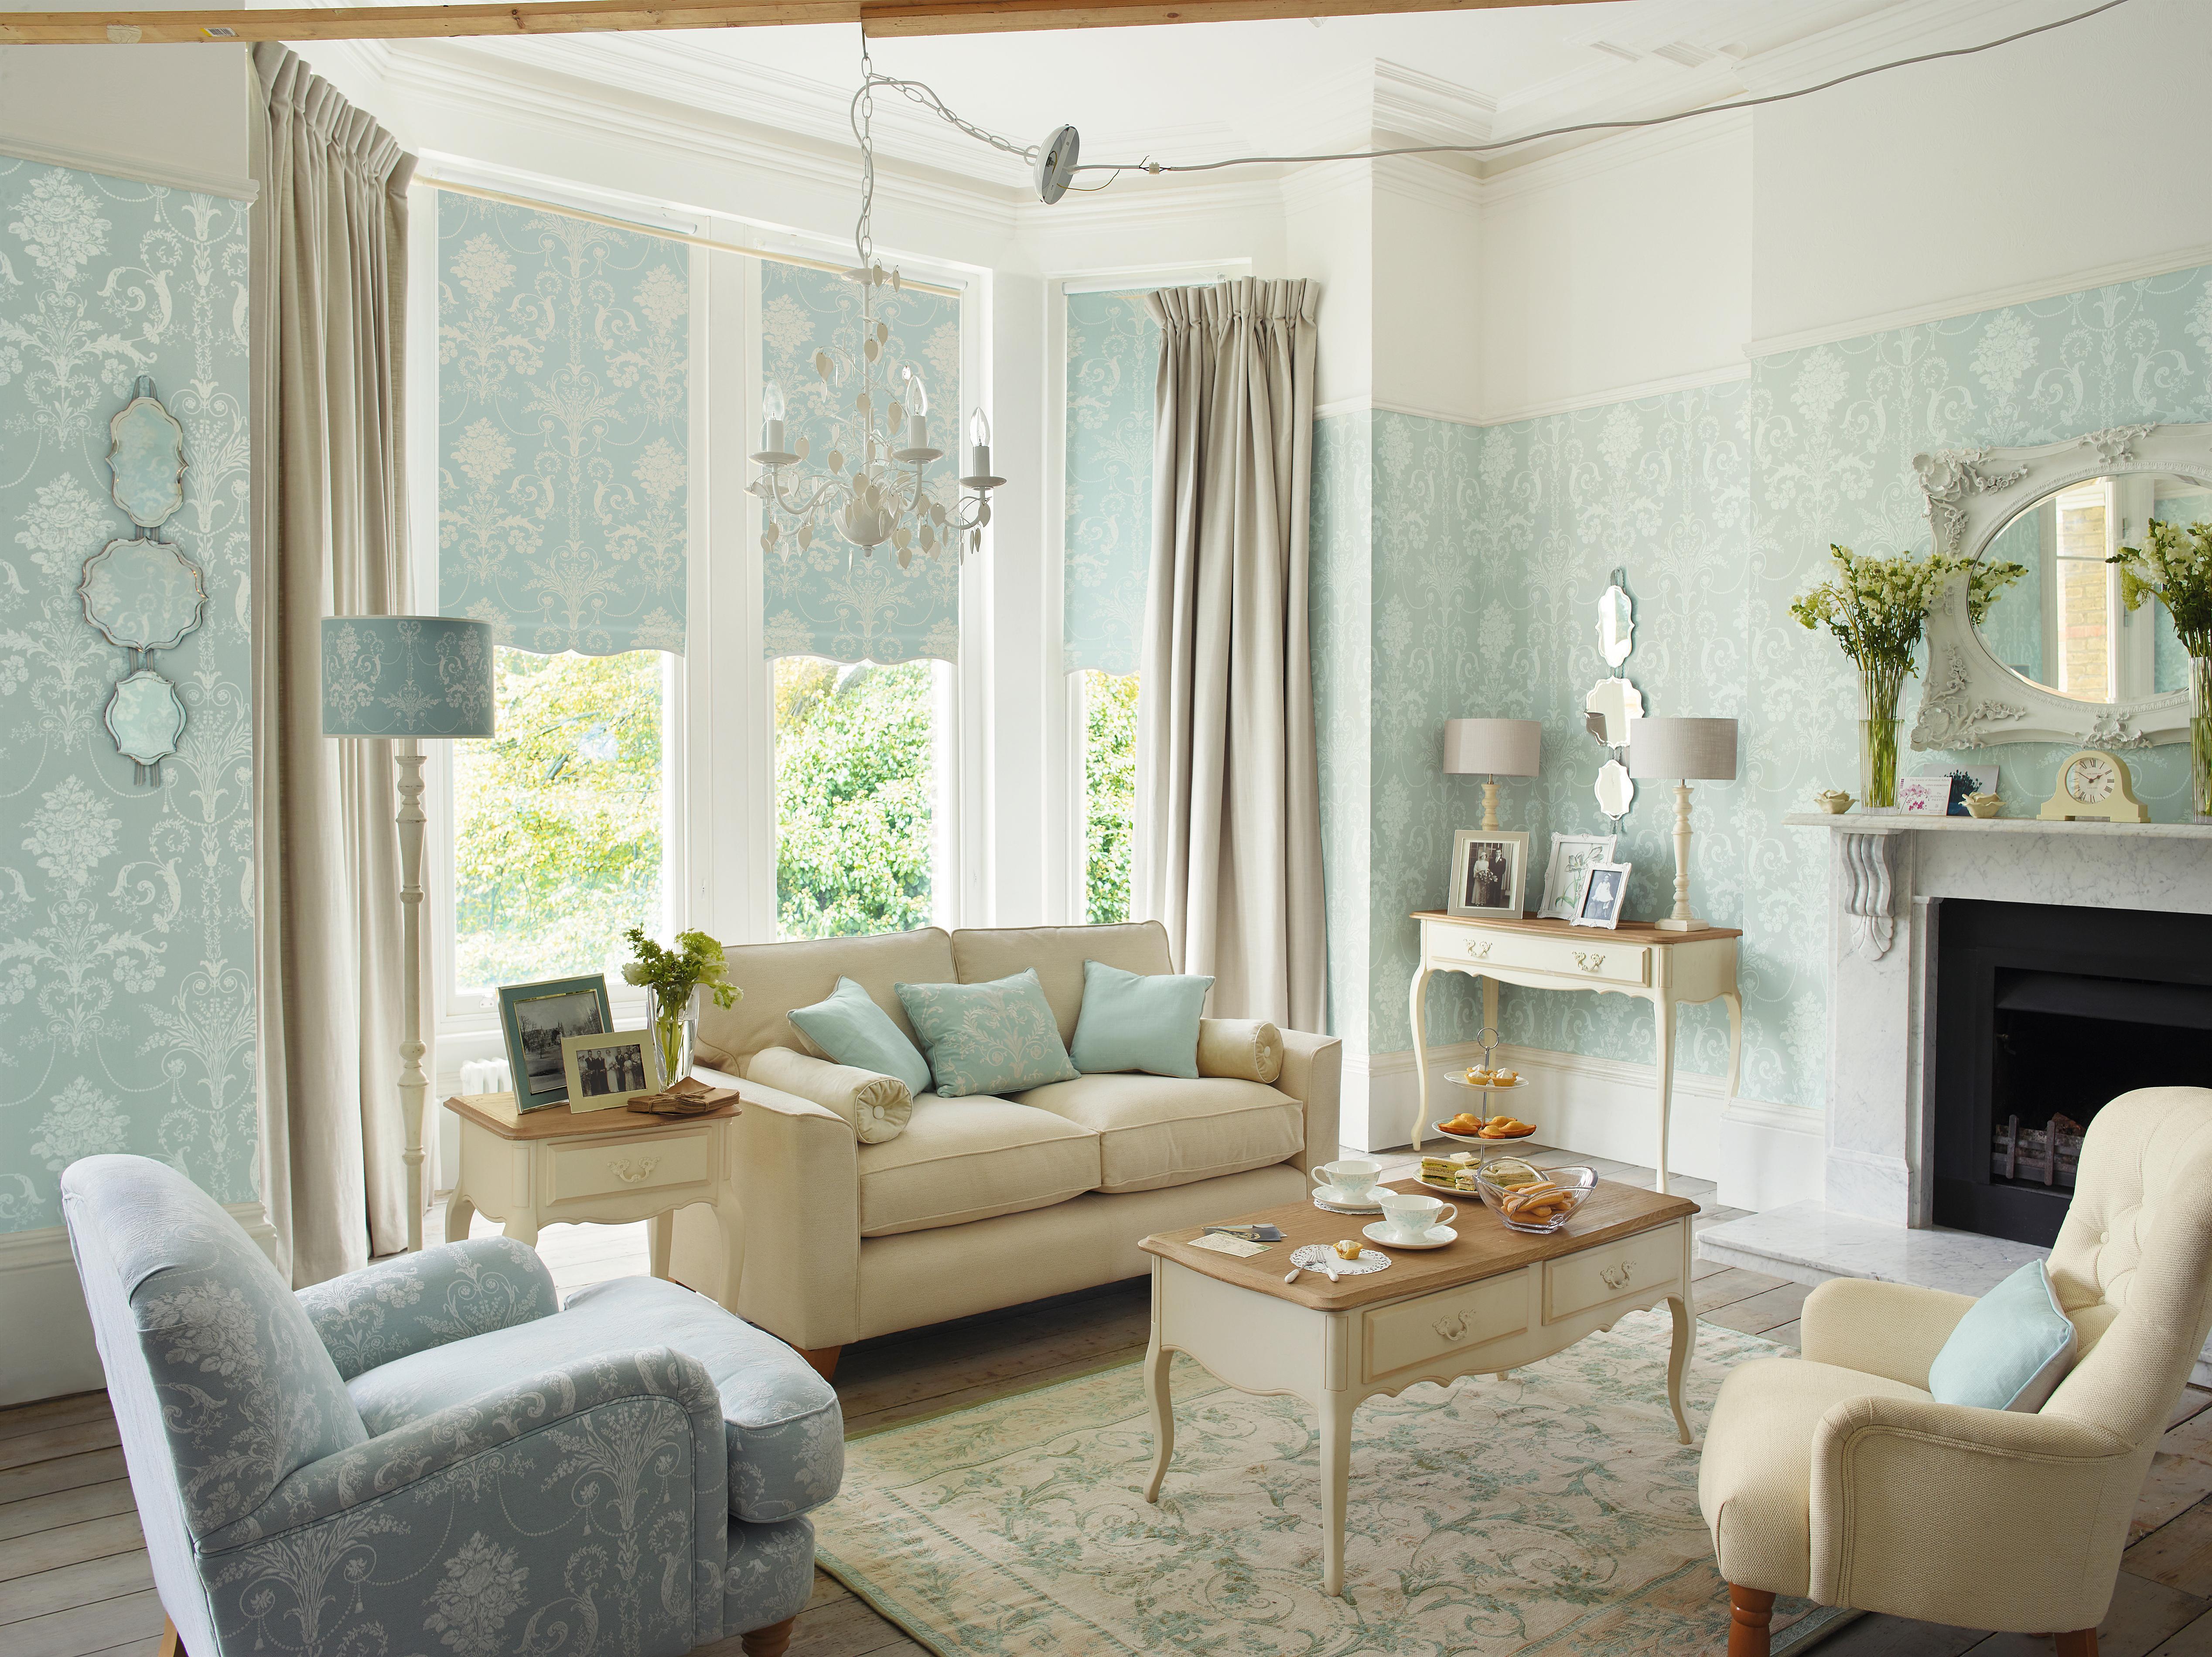 d co style cottage anglais femmes d 39 aujourd 39 hui. Black Bedroom Furniture Sets. Home Design Ideas